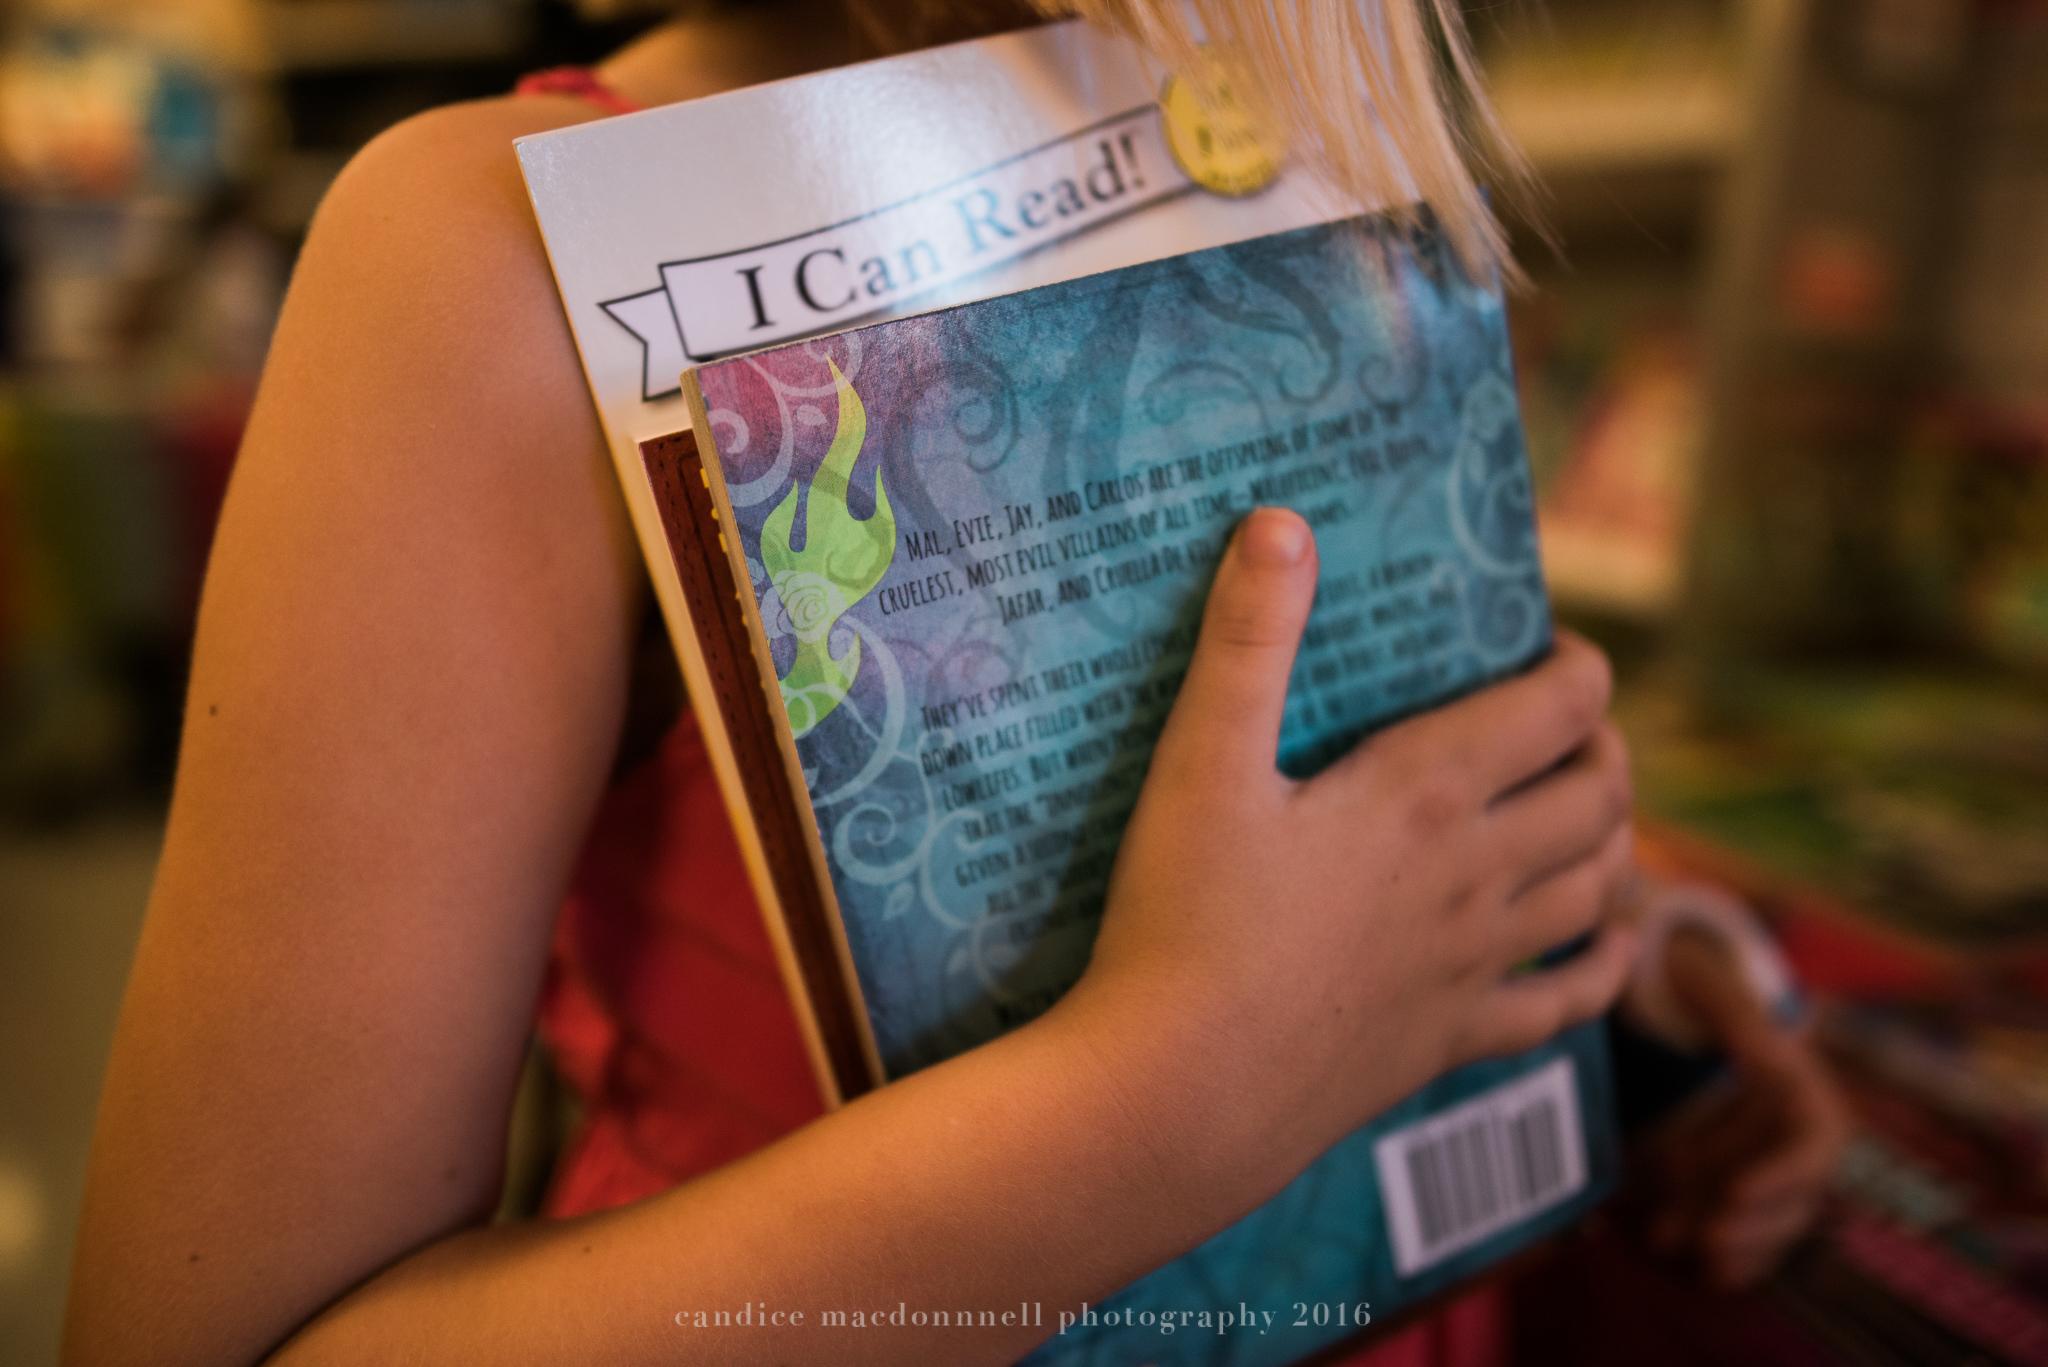 girl holding books at bookfair oahu hawaii photography